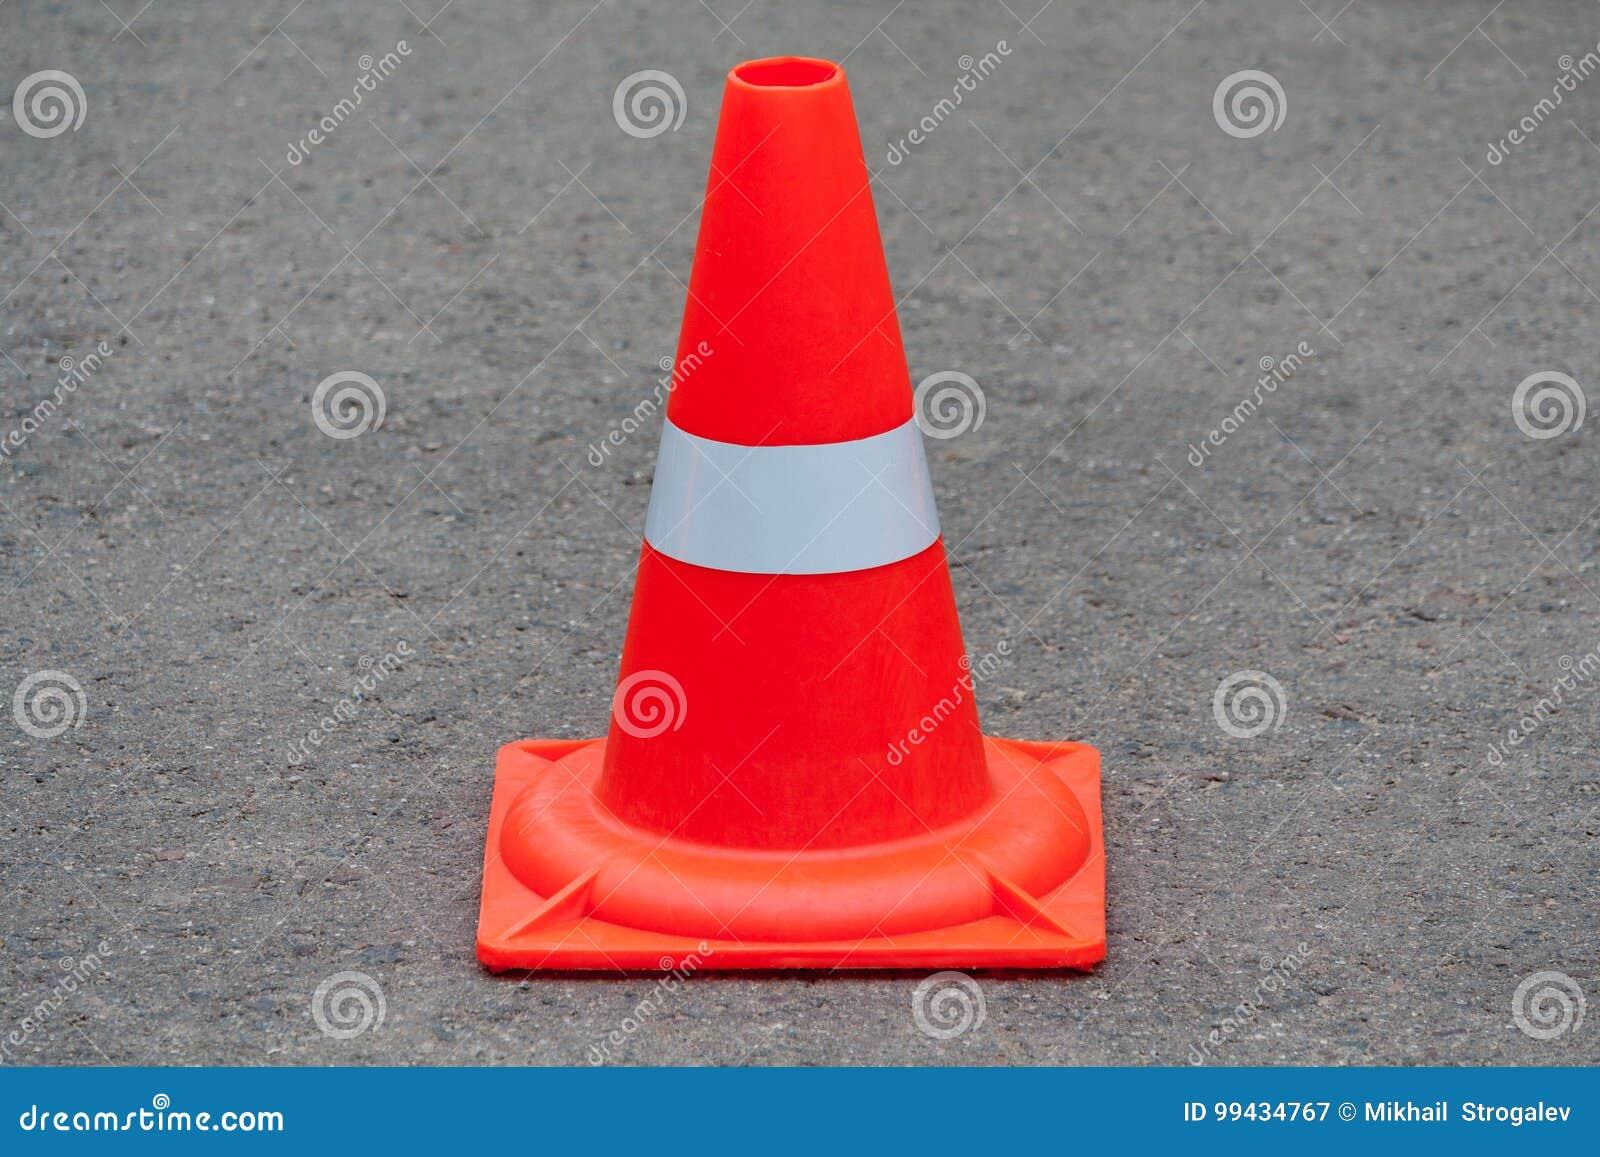 Cône orange du trafic